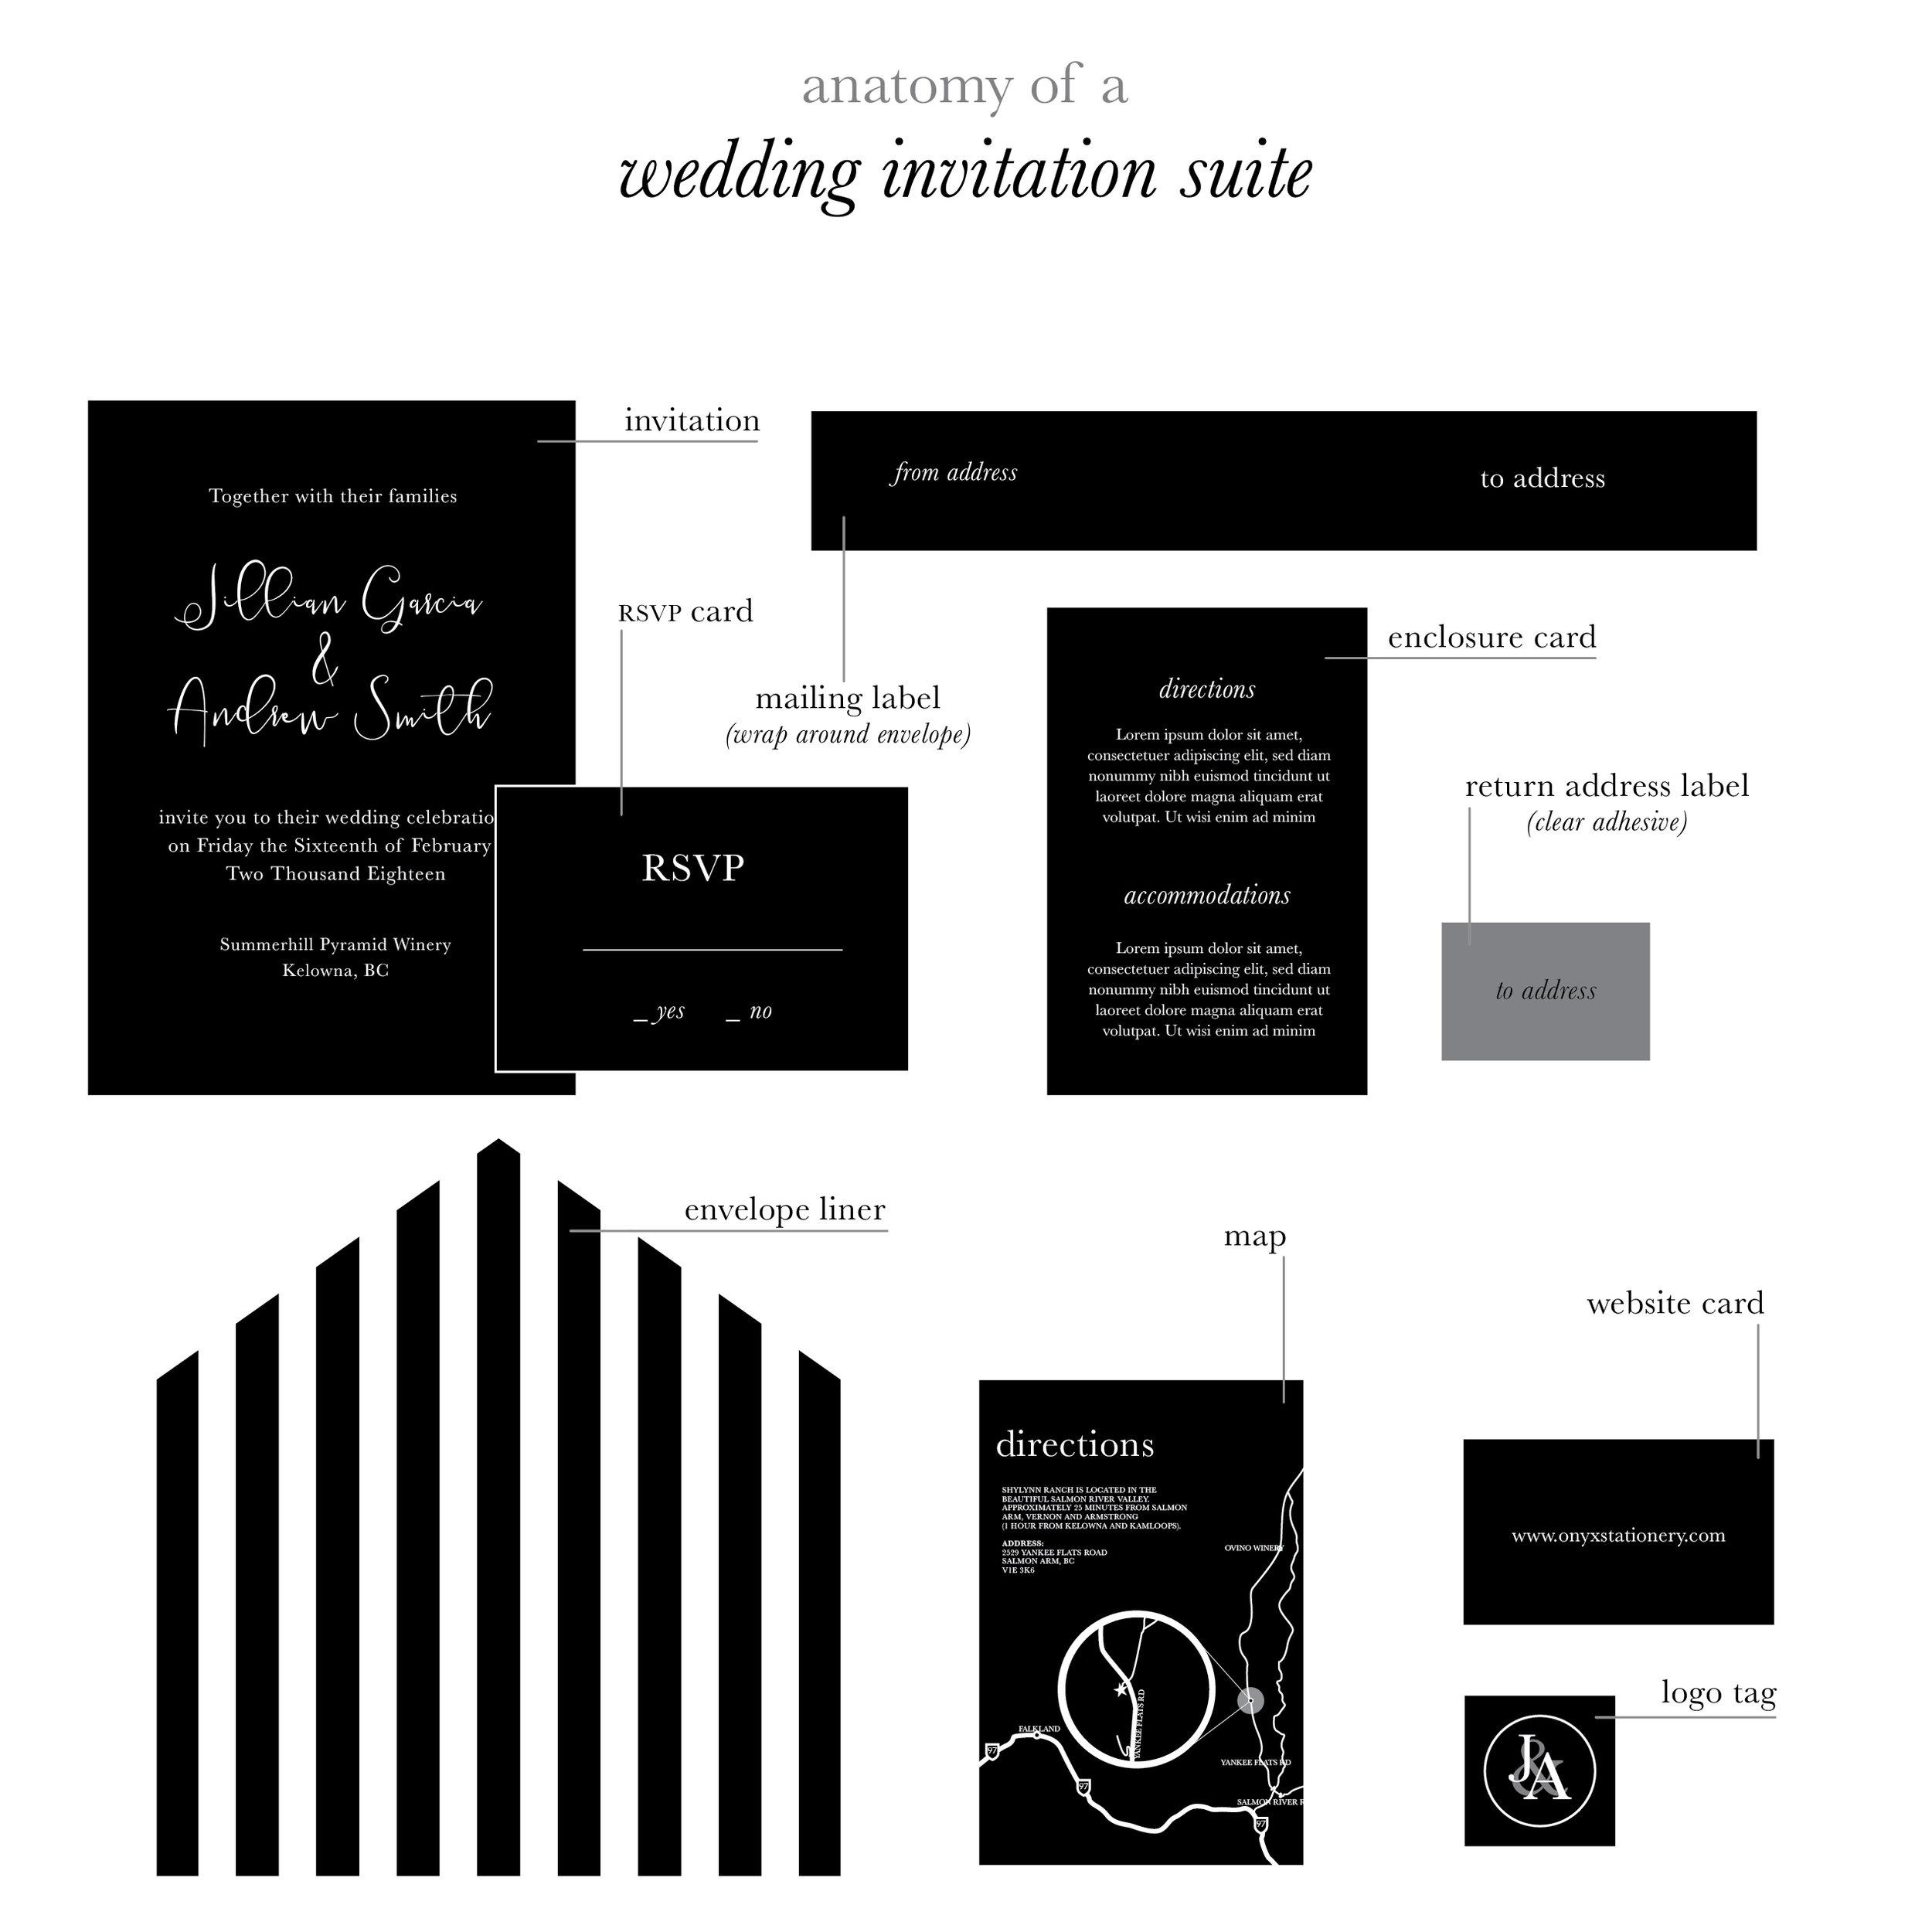 invitation-anatomy.jpg